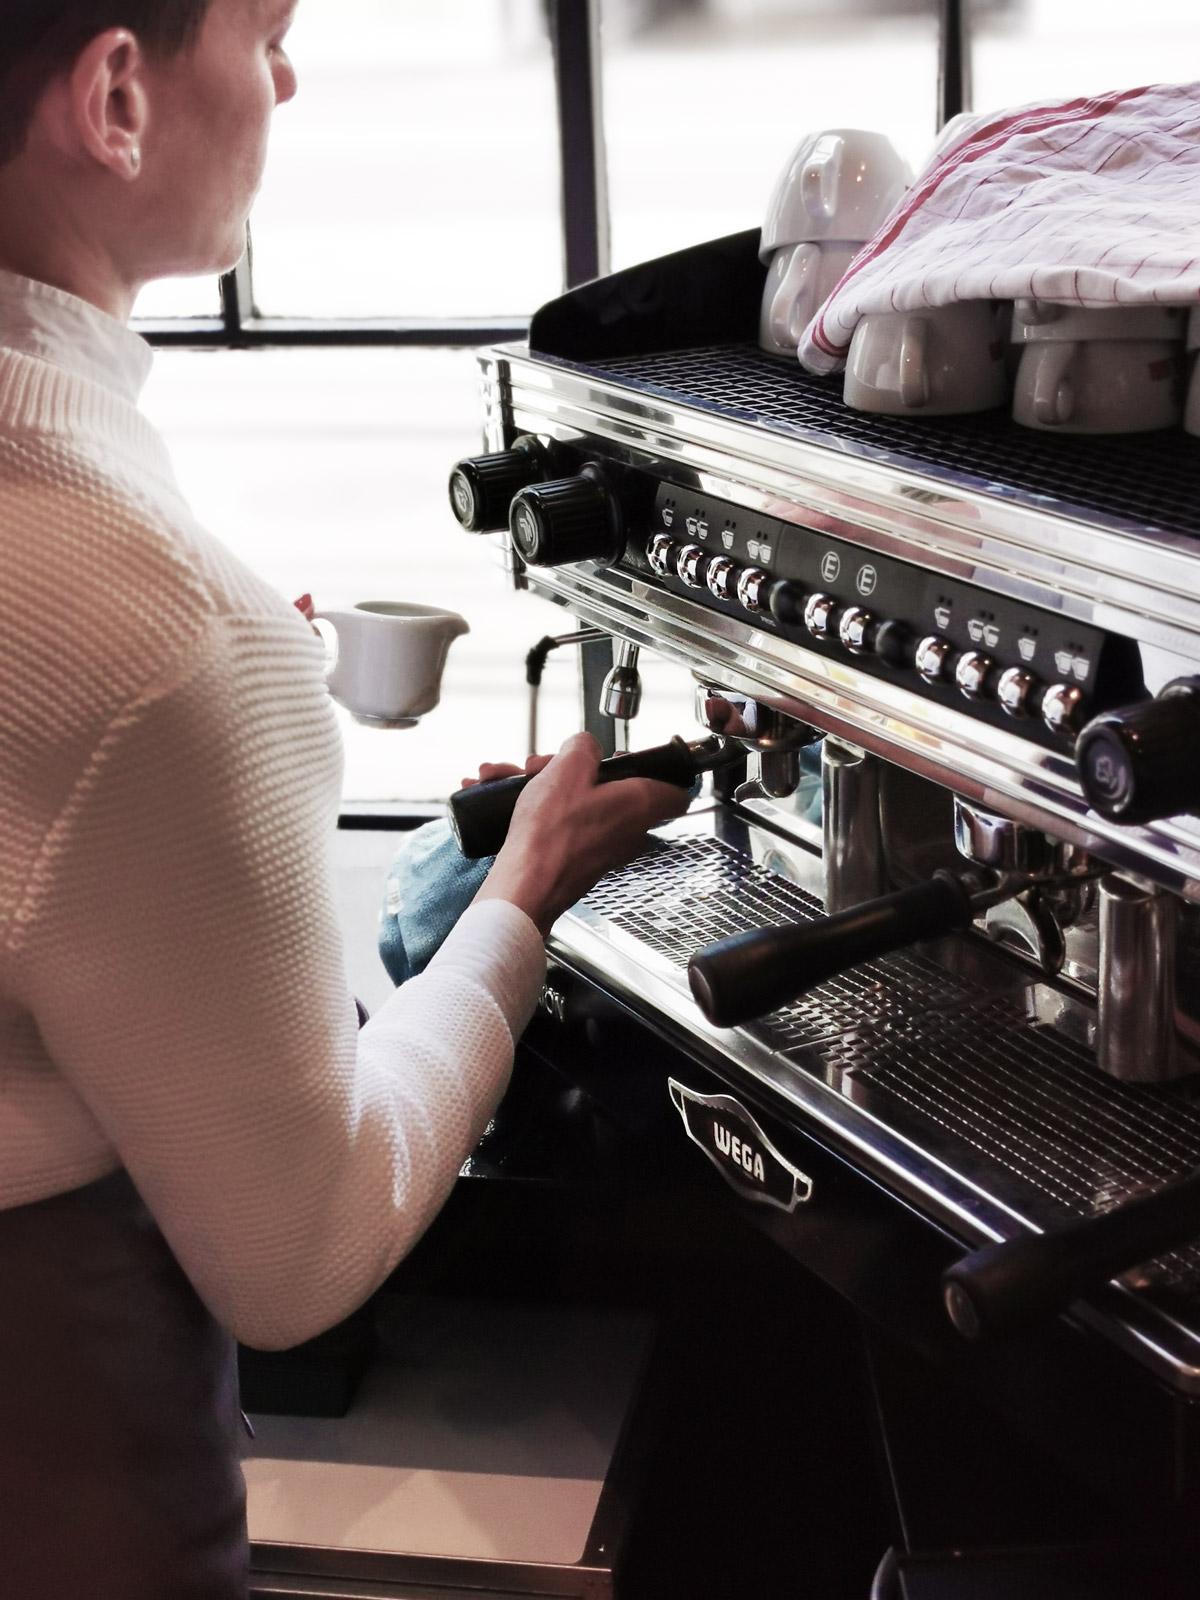 Freya_Zurich_Coffee_Kaffeemaschine_Wega.jpg